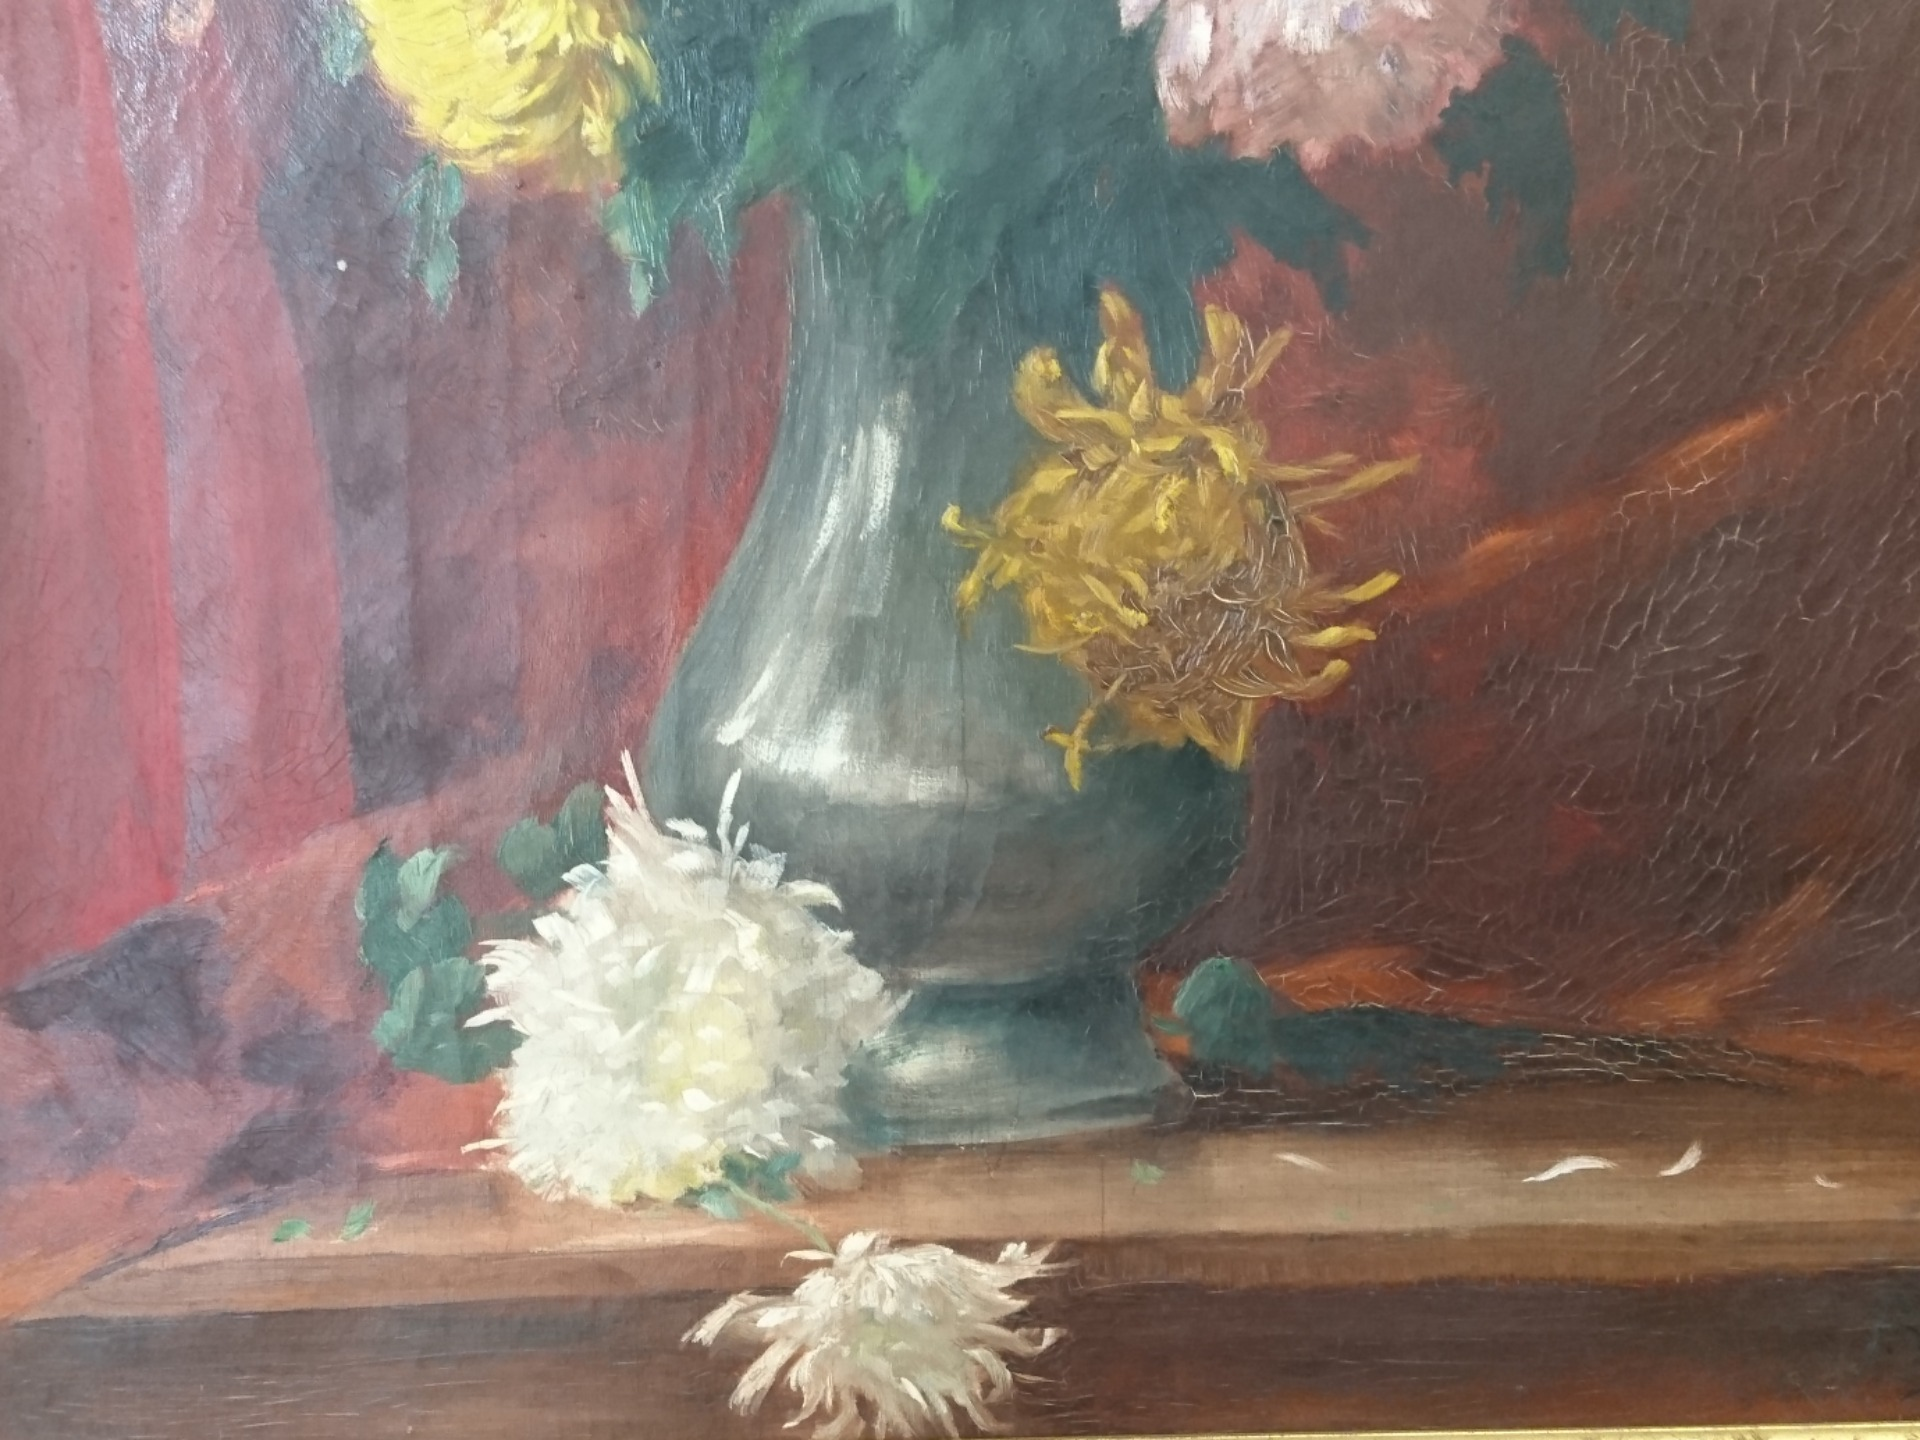 thumb4|Vaso con fiori,Frank Villoughby Raymond